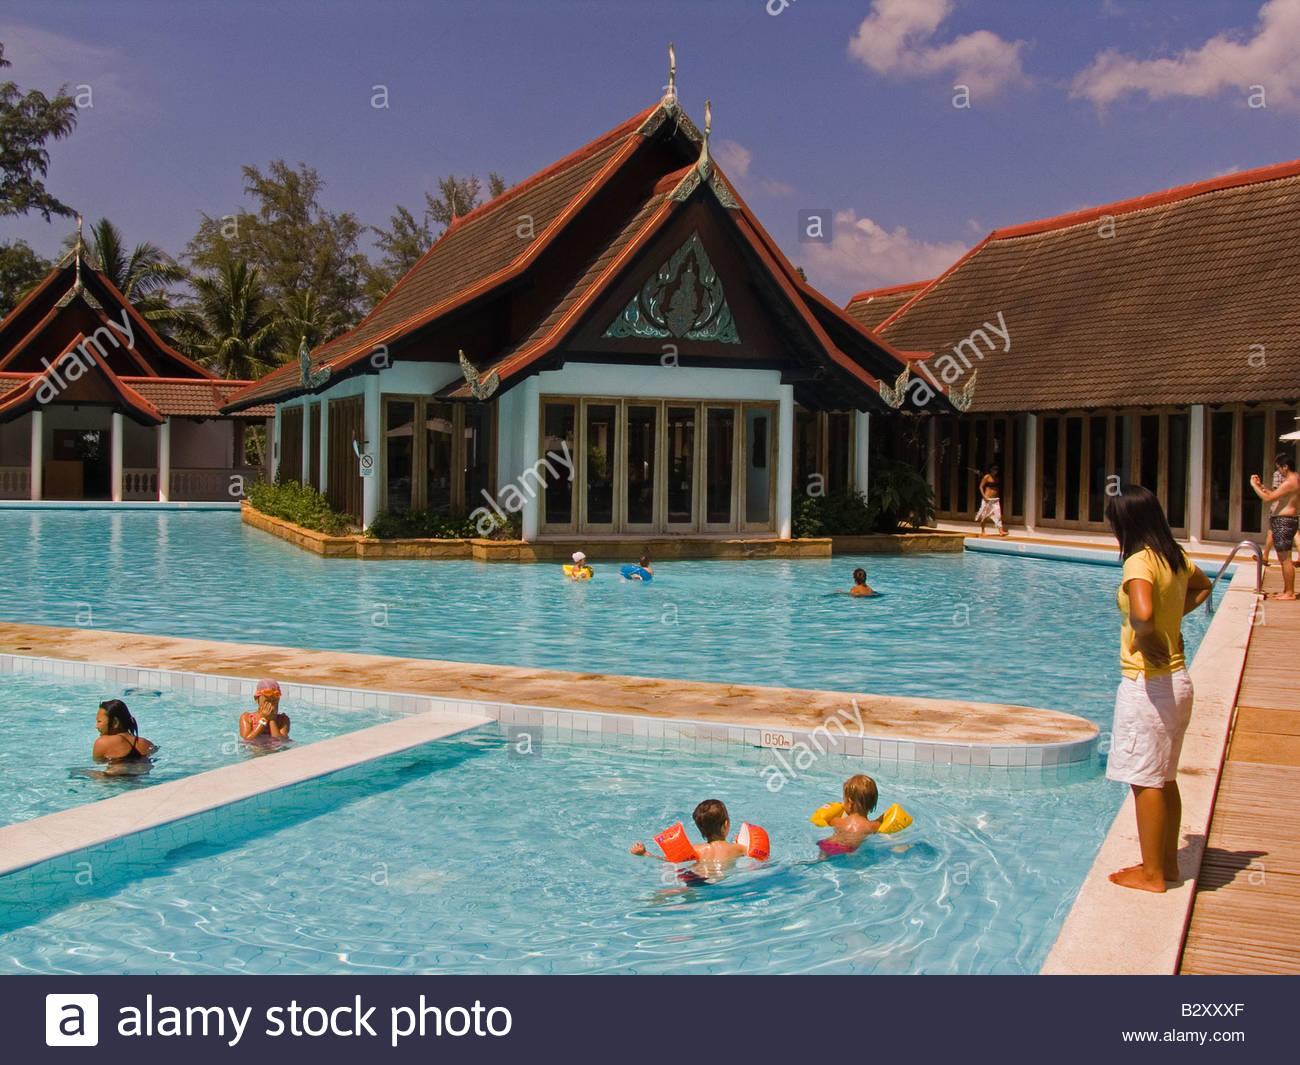 Asia Thailand Phuket Club Med Swimming Pool Stock Photo Royalty Free Image 19031559 Alamy